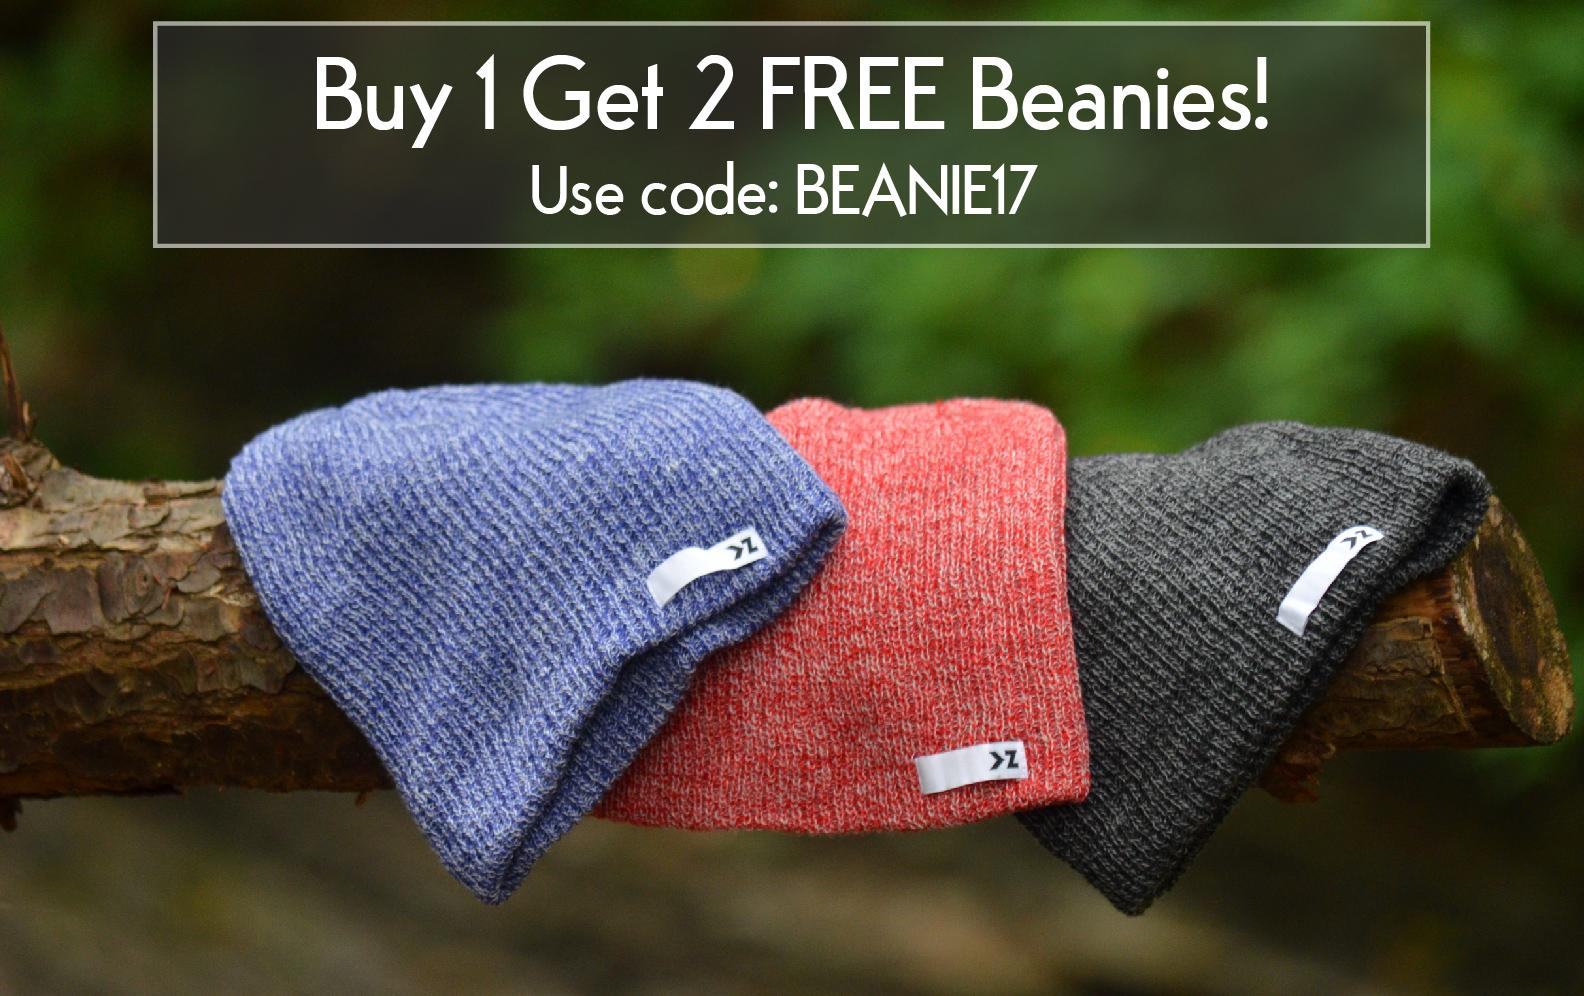 Beanie Offer